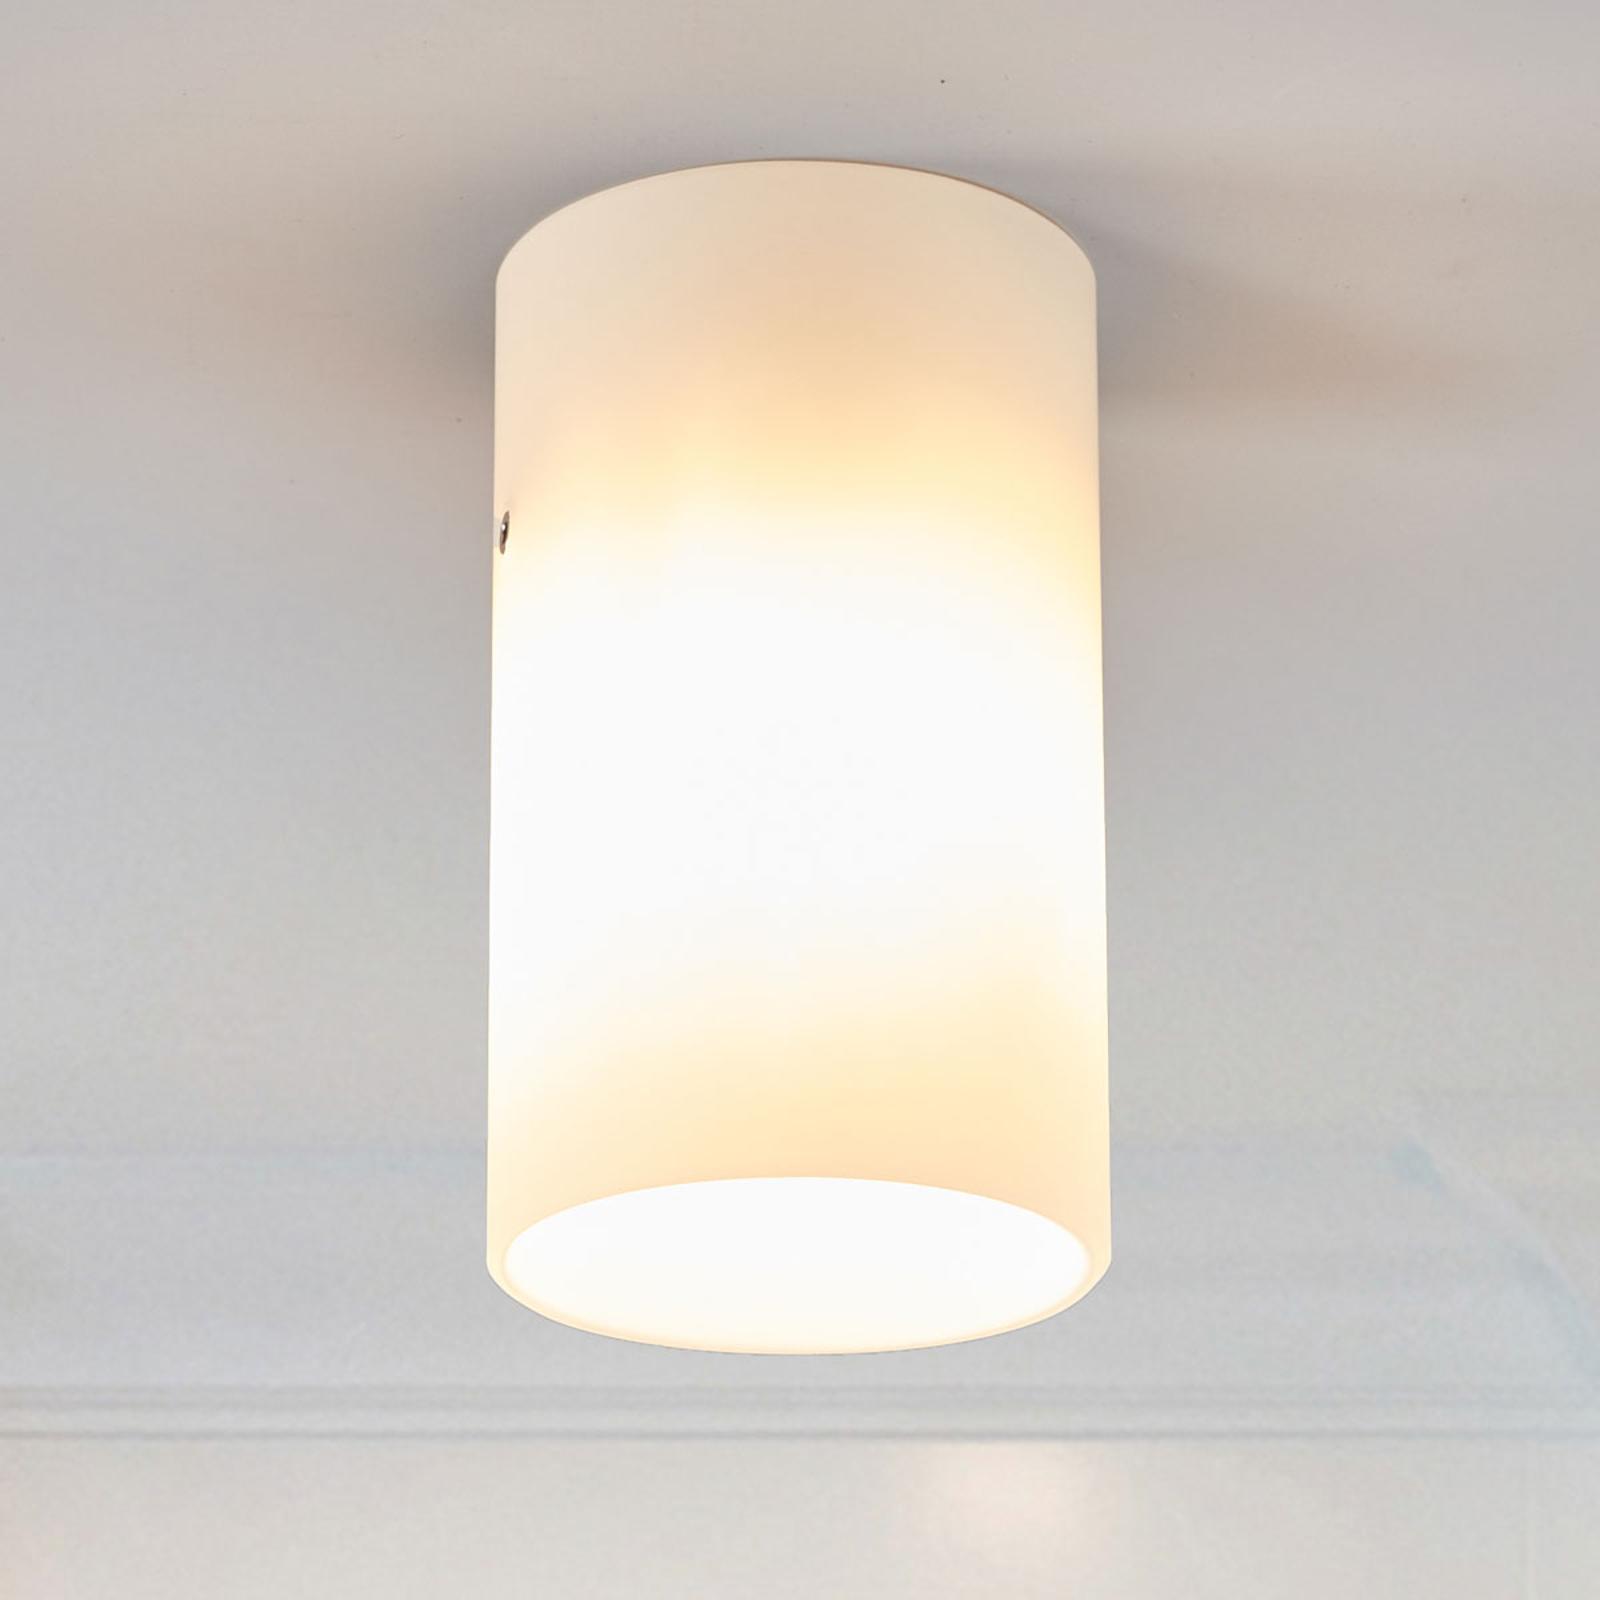 Casablanca Tube lampa sufitowa, Ø 6 cm, oprawa G9